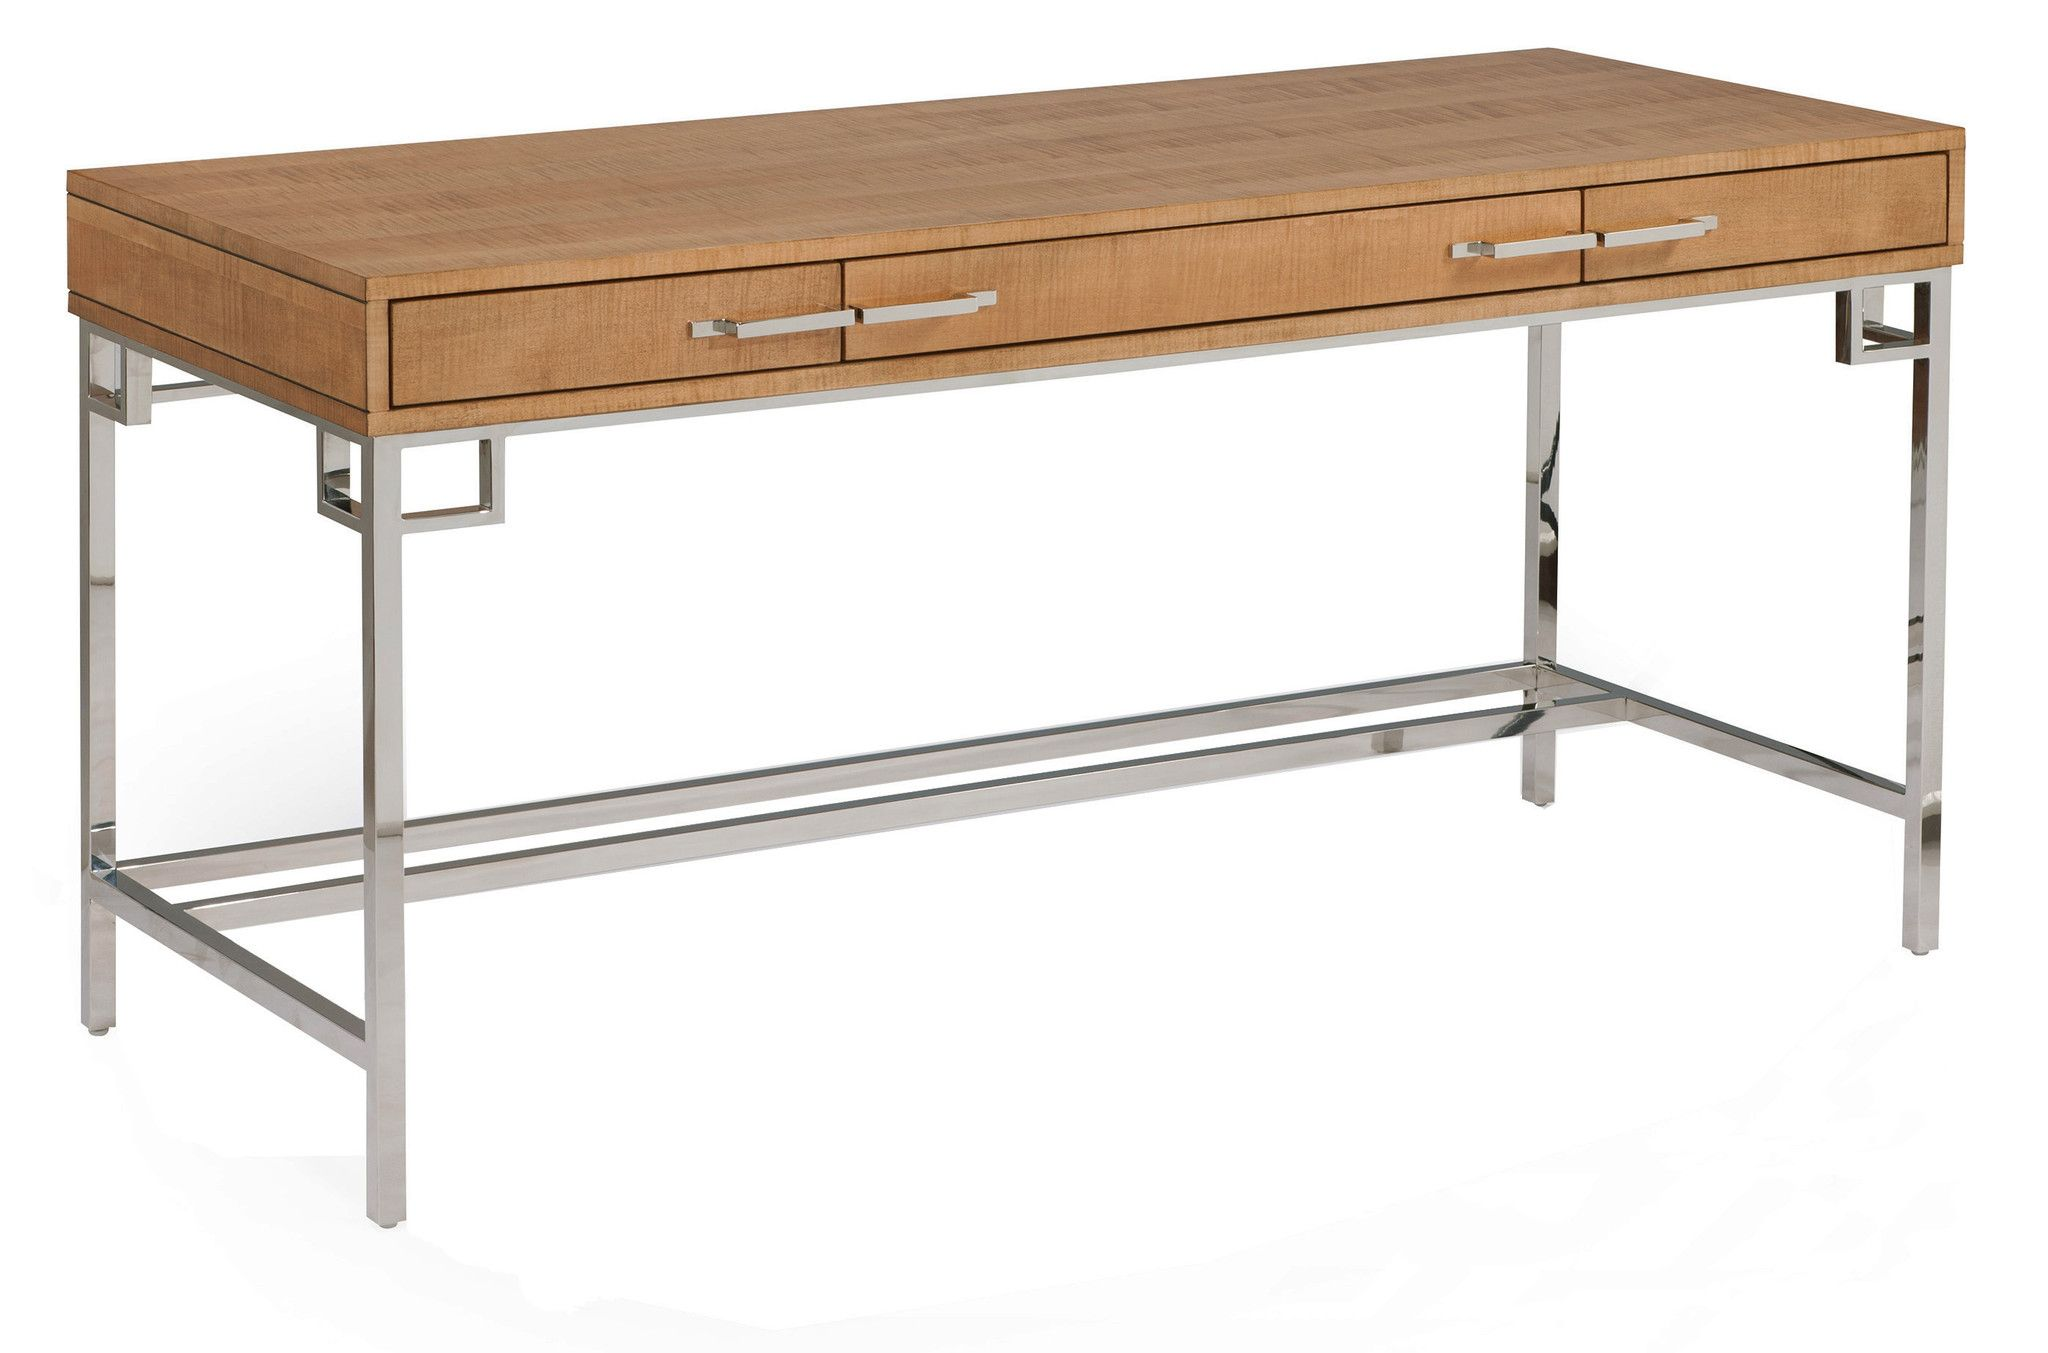 Asher Writing Desk Belle Meade Desk Desk Prices Contemporary Desk